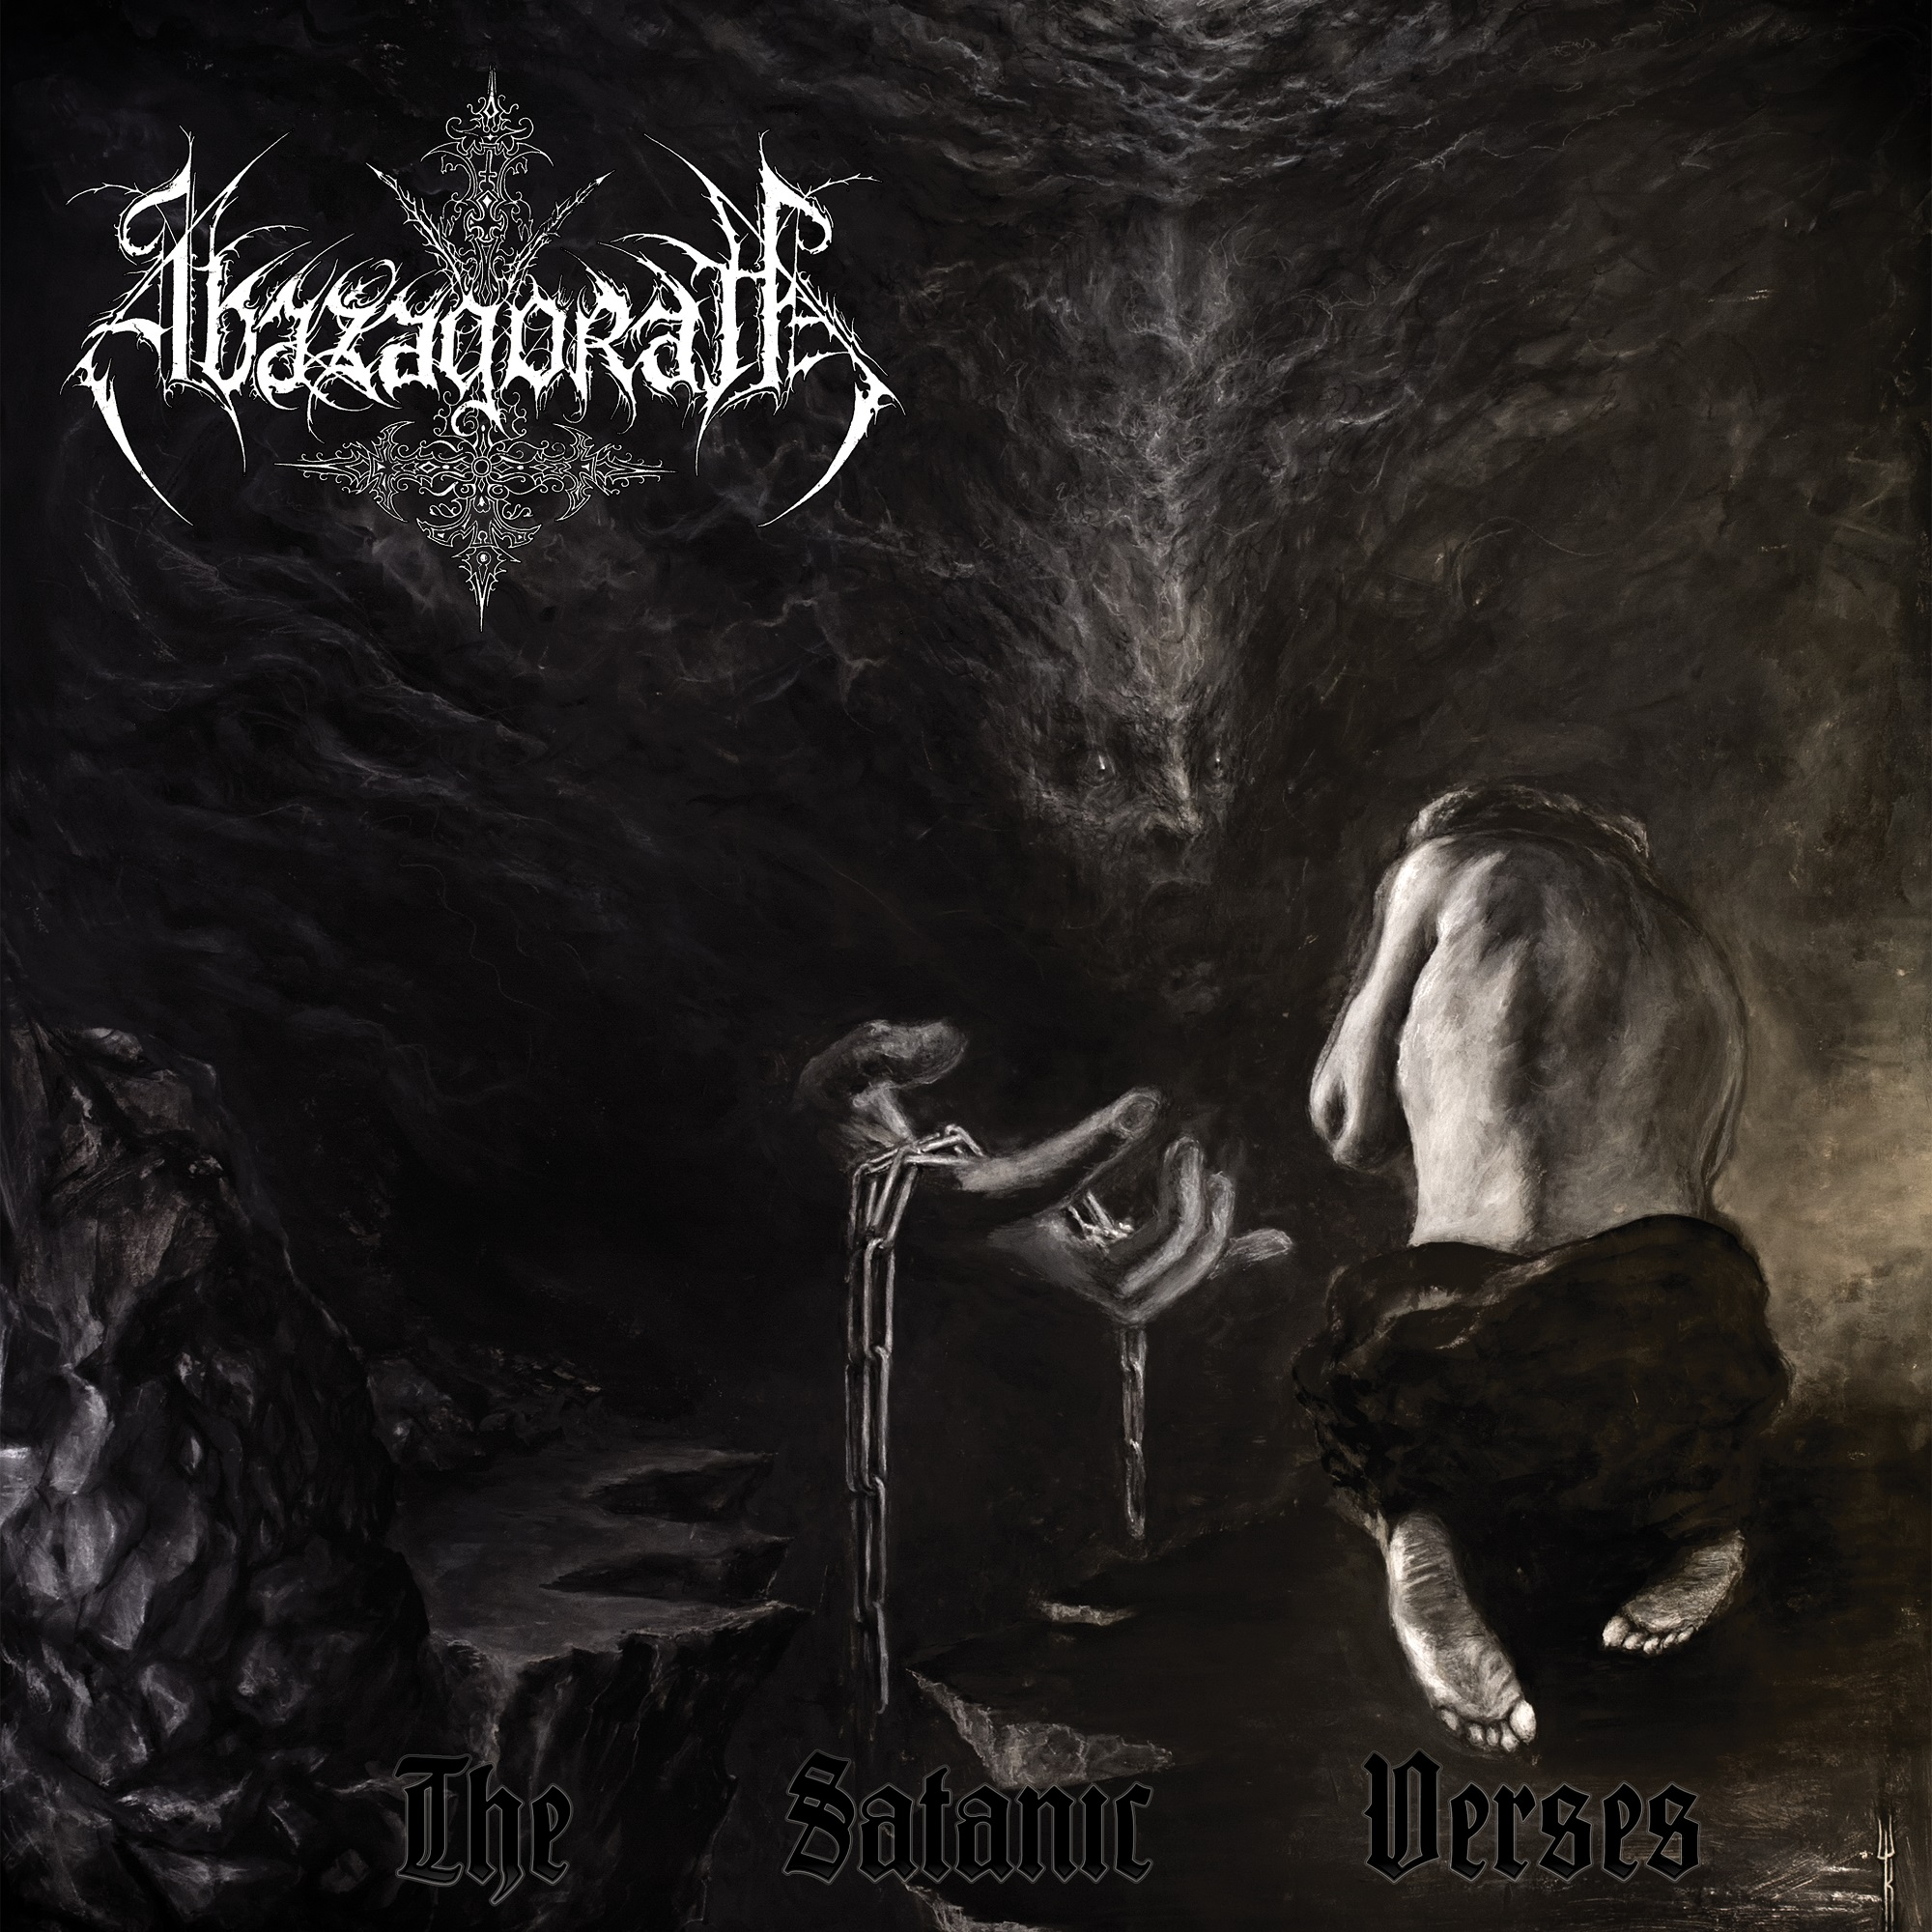 Evil Satan Qoutes: Abazagorath - The Satanic Verses Review